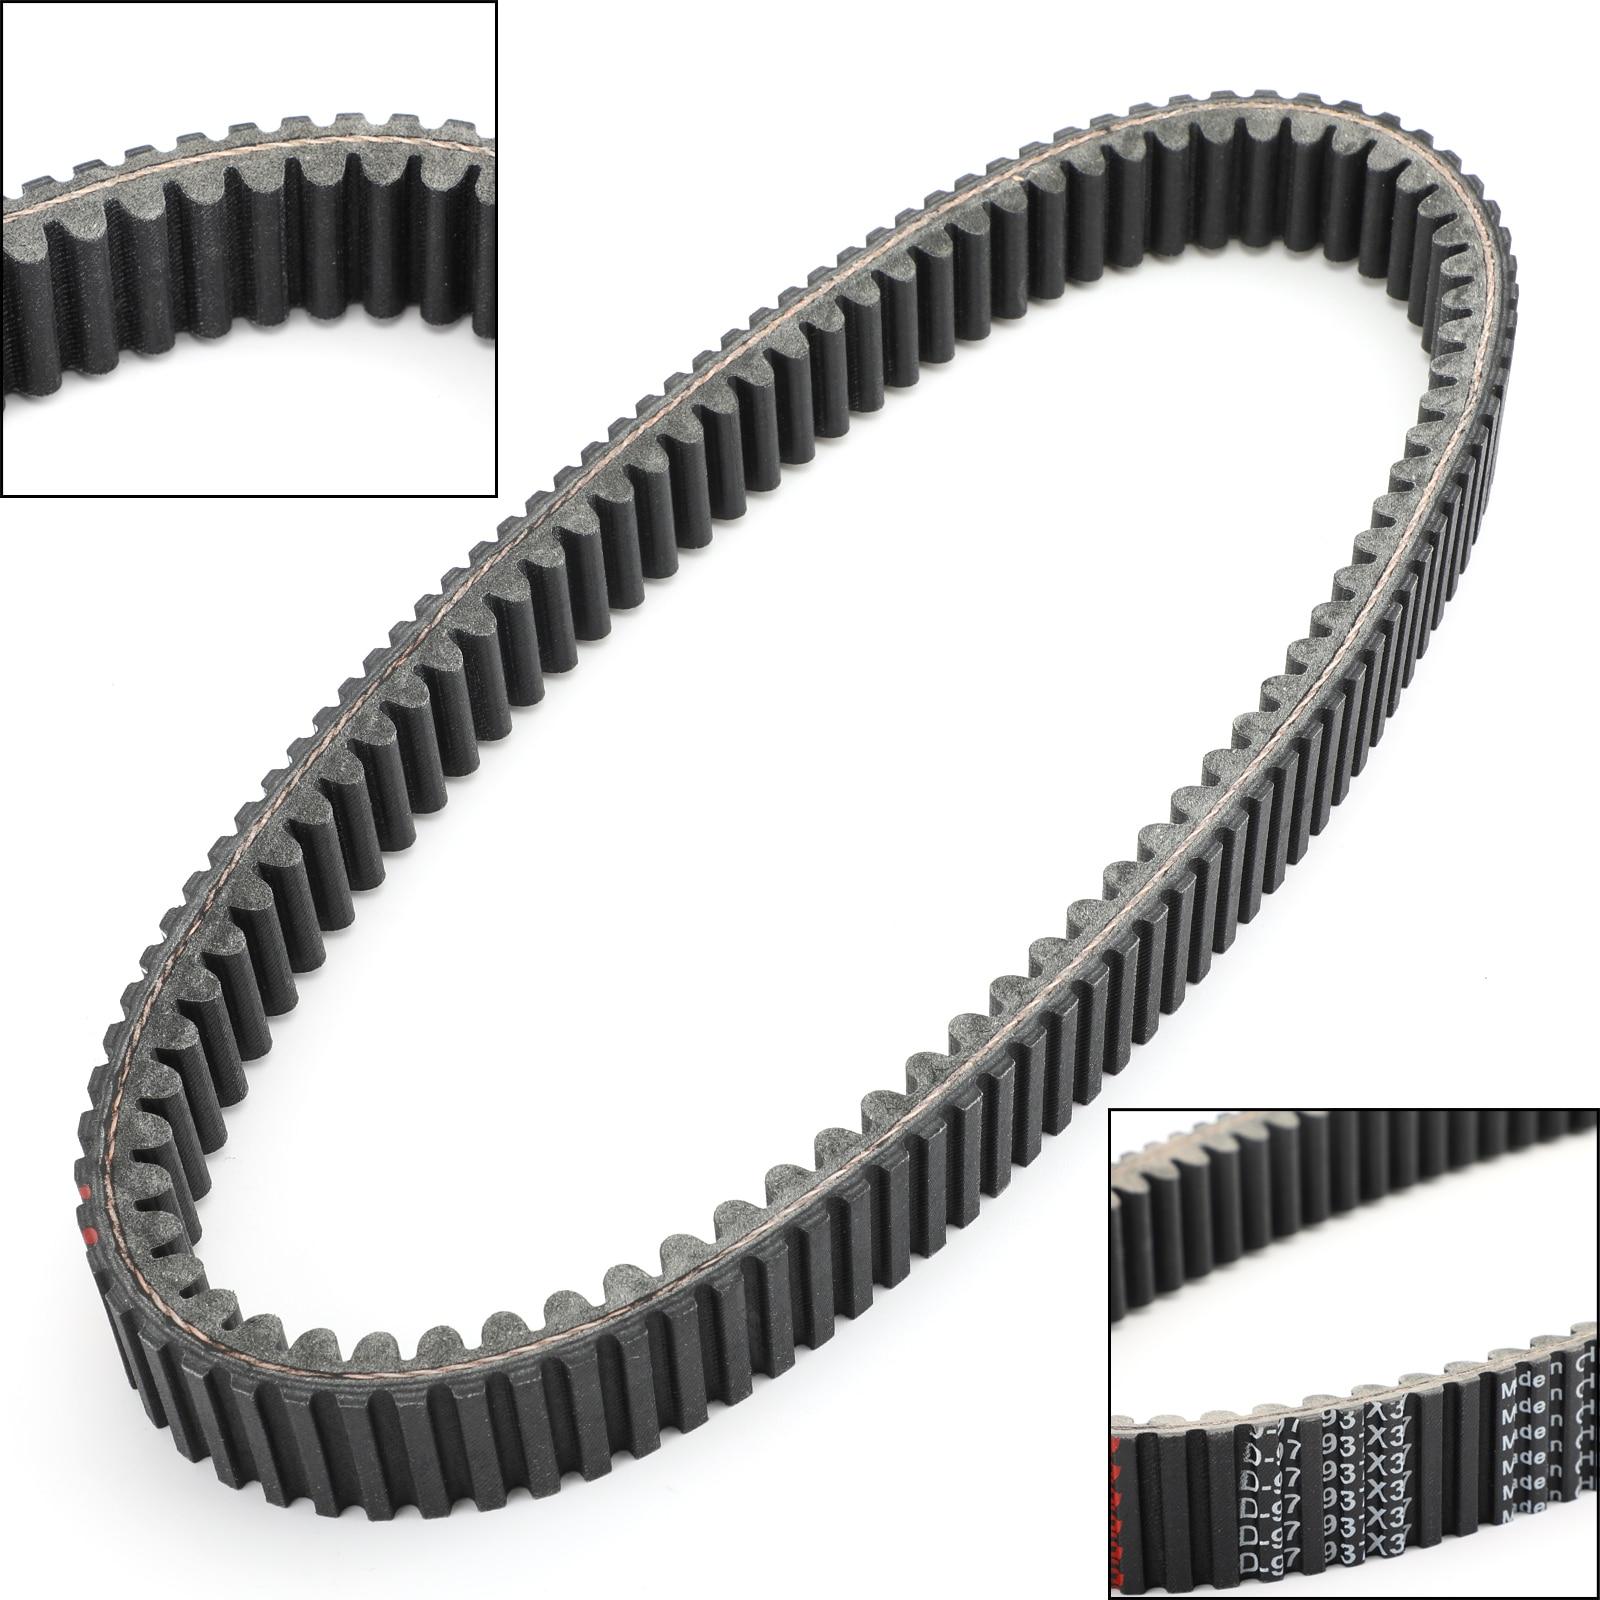 Artudatech 0823-013 Drive Belt For Textron Alterra Arctic Cat 500 550 650 700 Prowler ATV 0823013